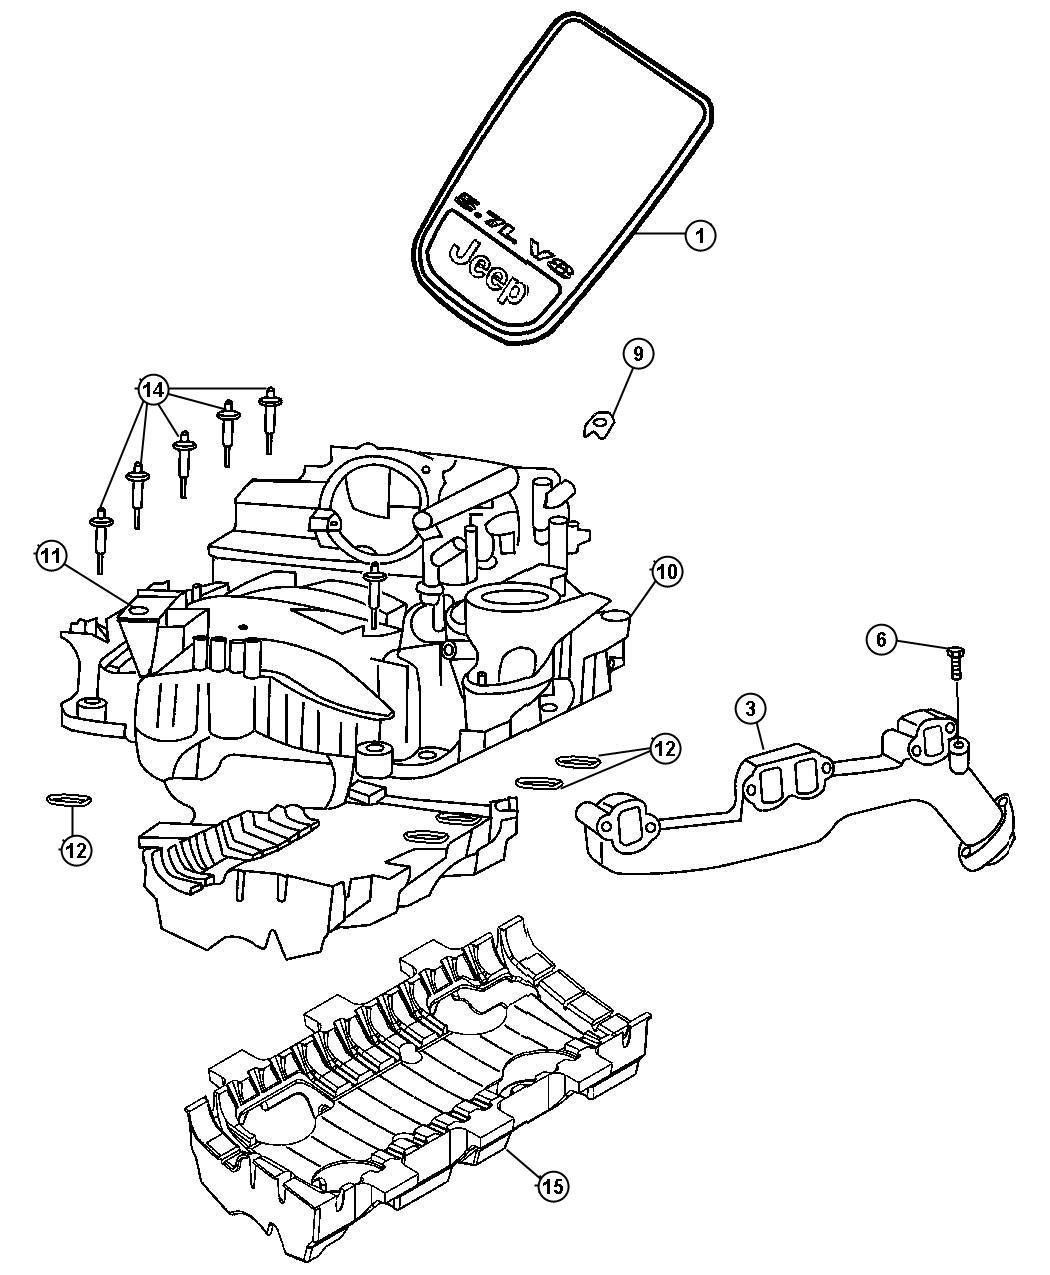 Jeep Grand Cherokee Manifold Exhaust Right Hemi Engine